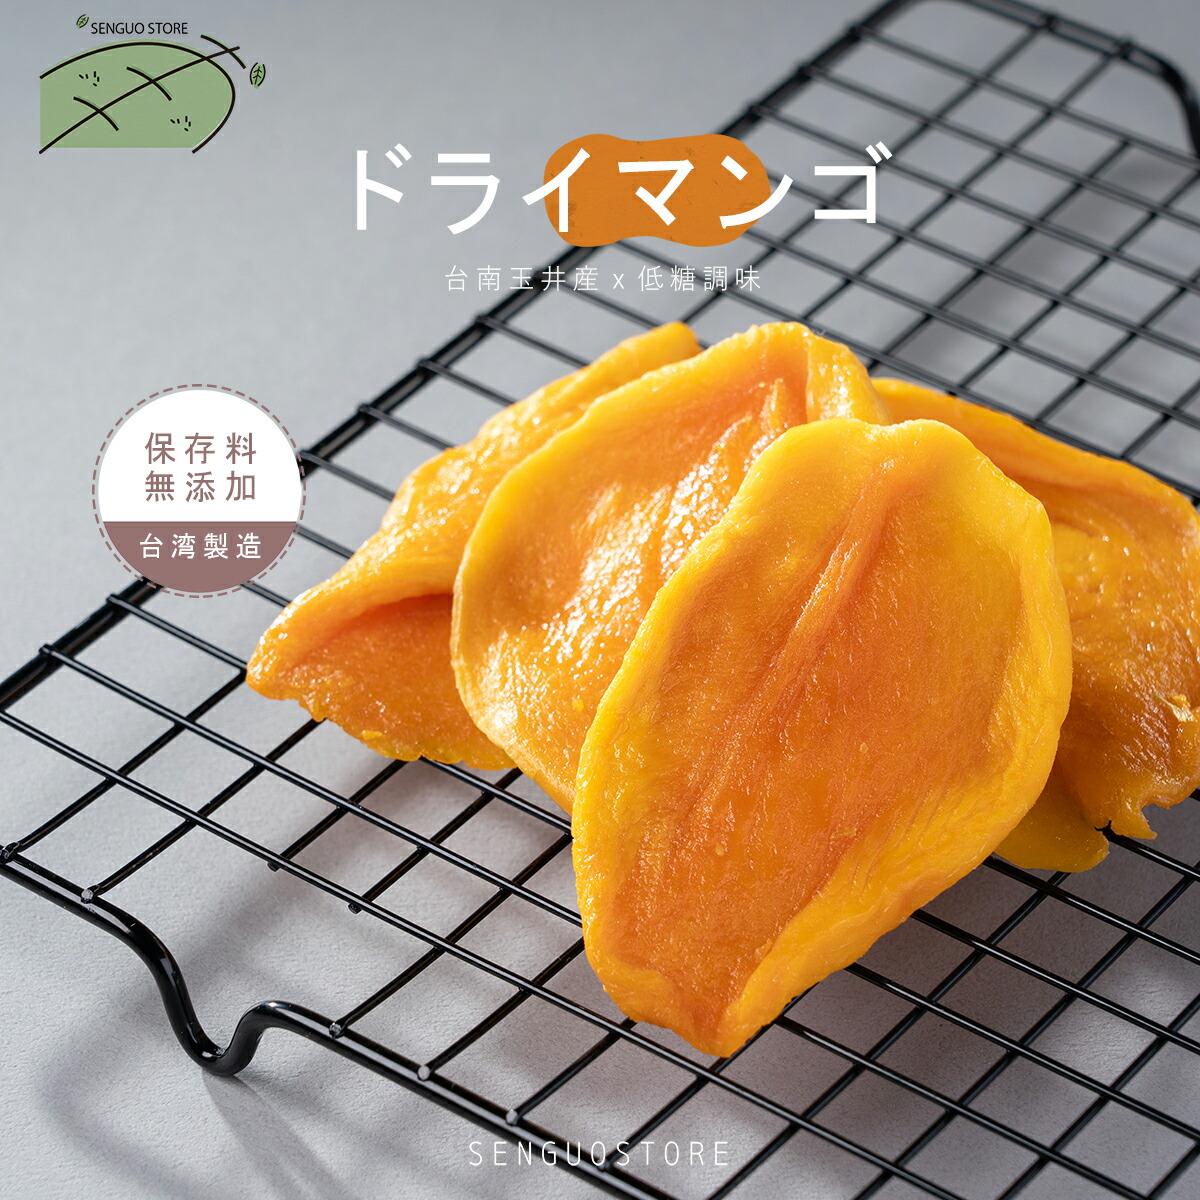 Senguo ドライマンゴ アーウィン 250g ドライフルーツ チップス 乾燥 ヘルシー 100%天然 スナック ジューシー【senguo】【台湾直送】【202006set06】